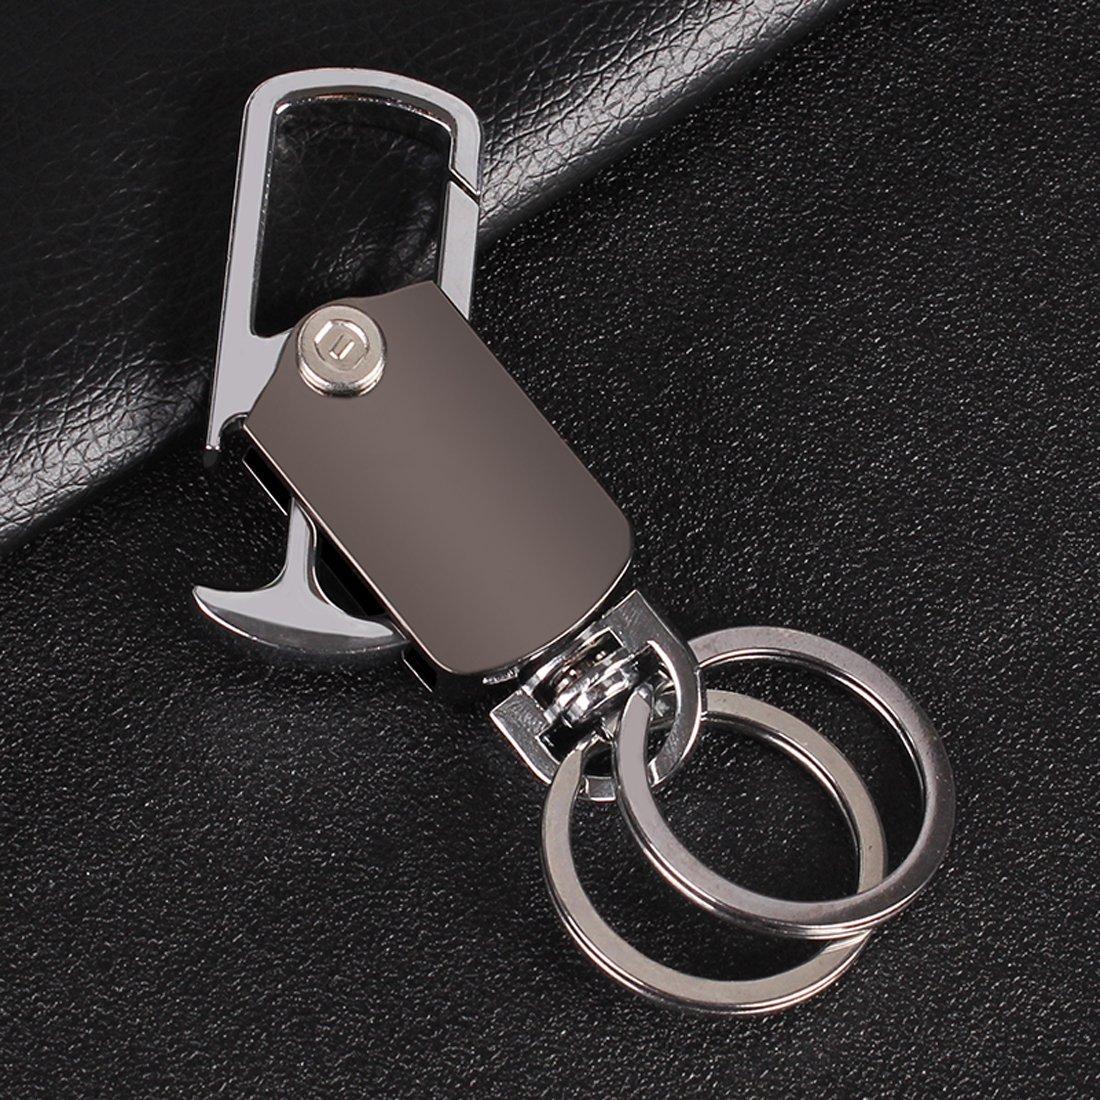 JOFUKIN Key Chain with 2 Key Rings Heavy Duty car Keychain for Mens and Women Gun Black